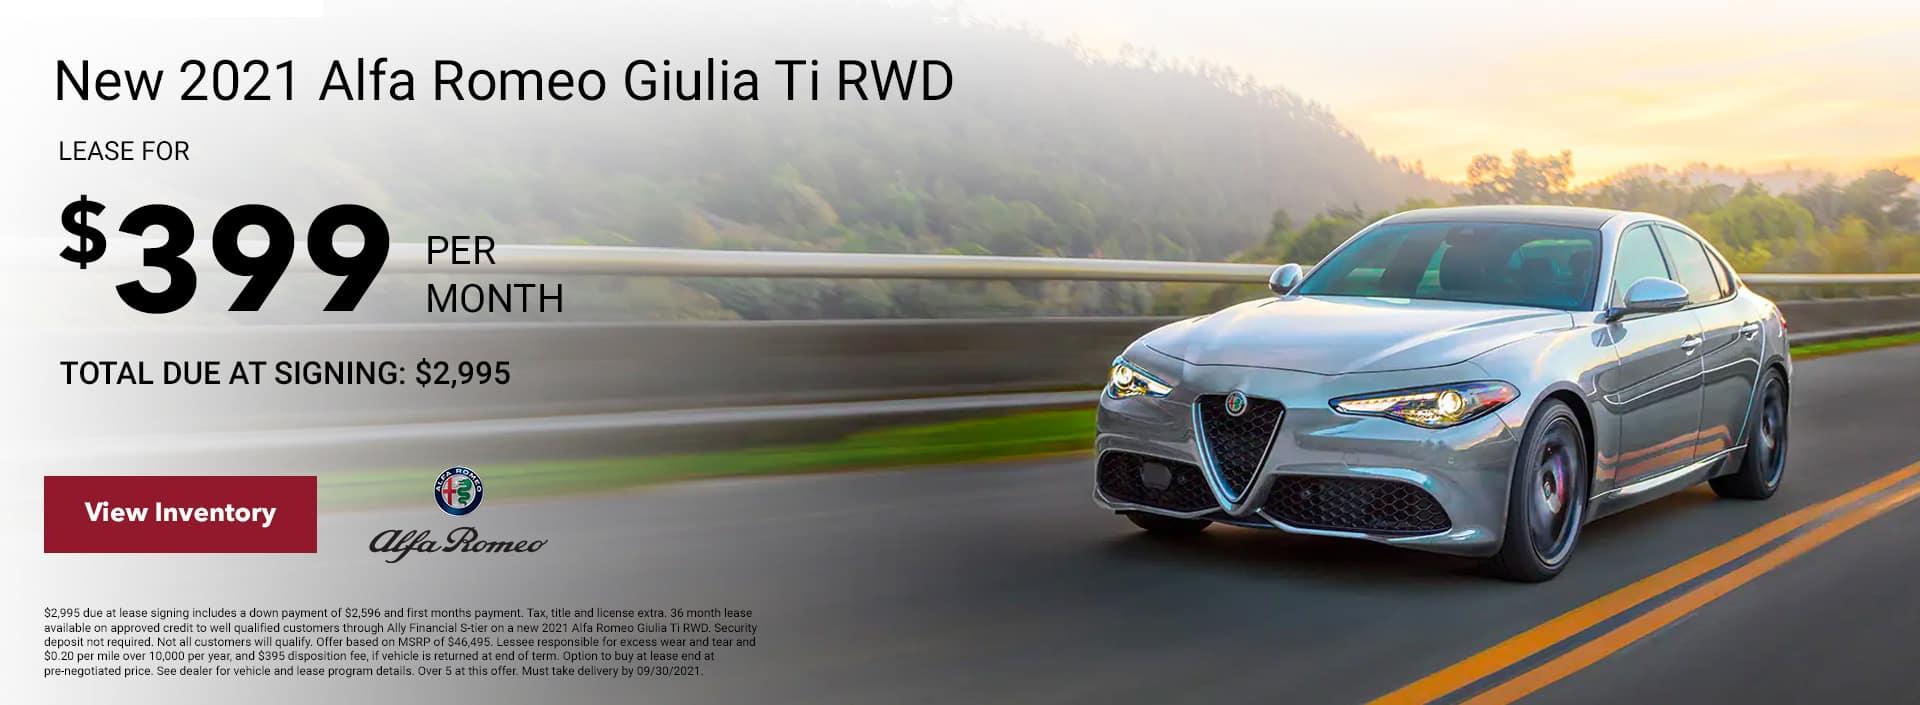 New 2021 Alfa Romeo Giulia Ti RWD Subheadline: Total due at signing: $2,995 $399/mo